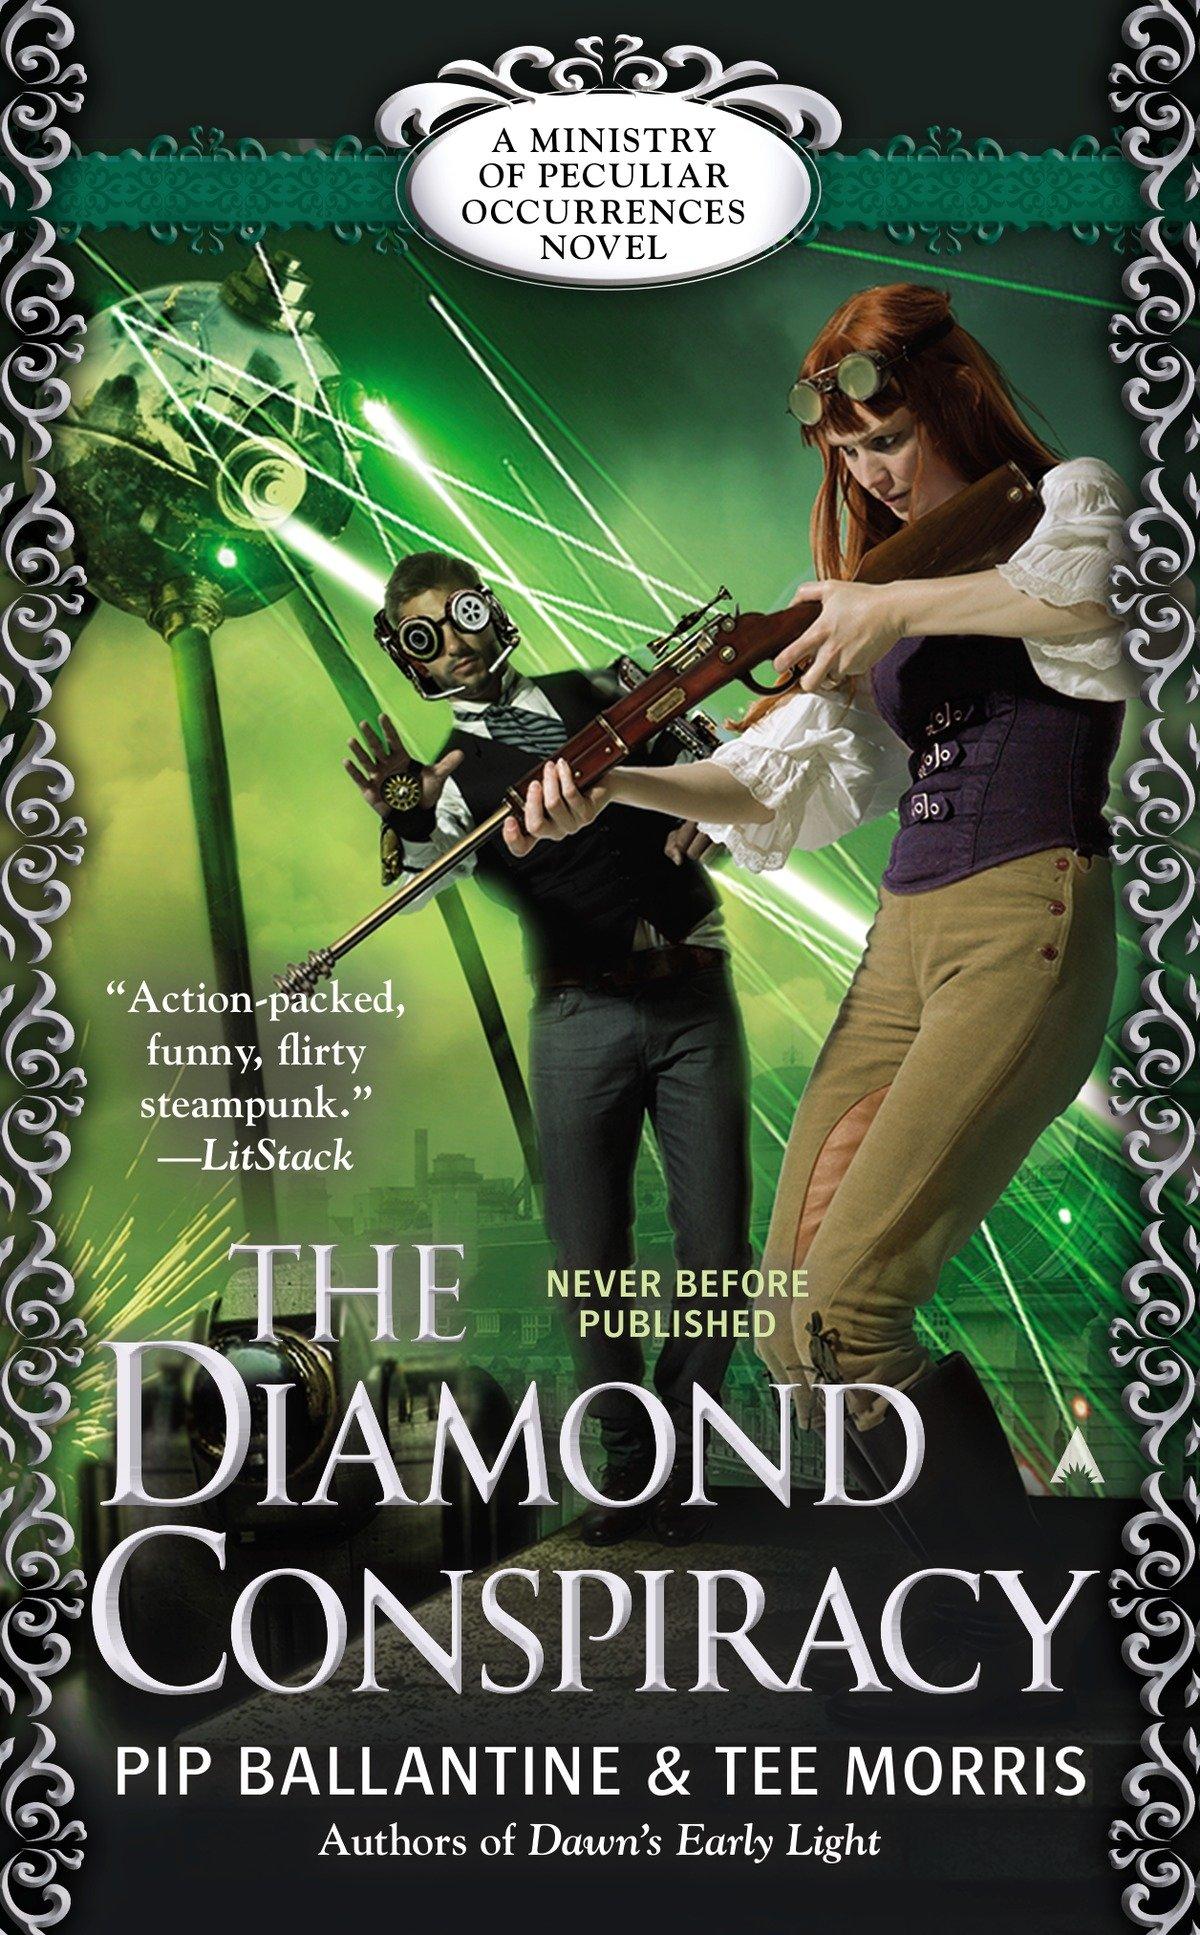 The Diamond Conspiracy (A Peculiar Occurrences Novel)